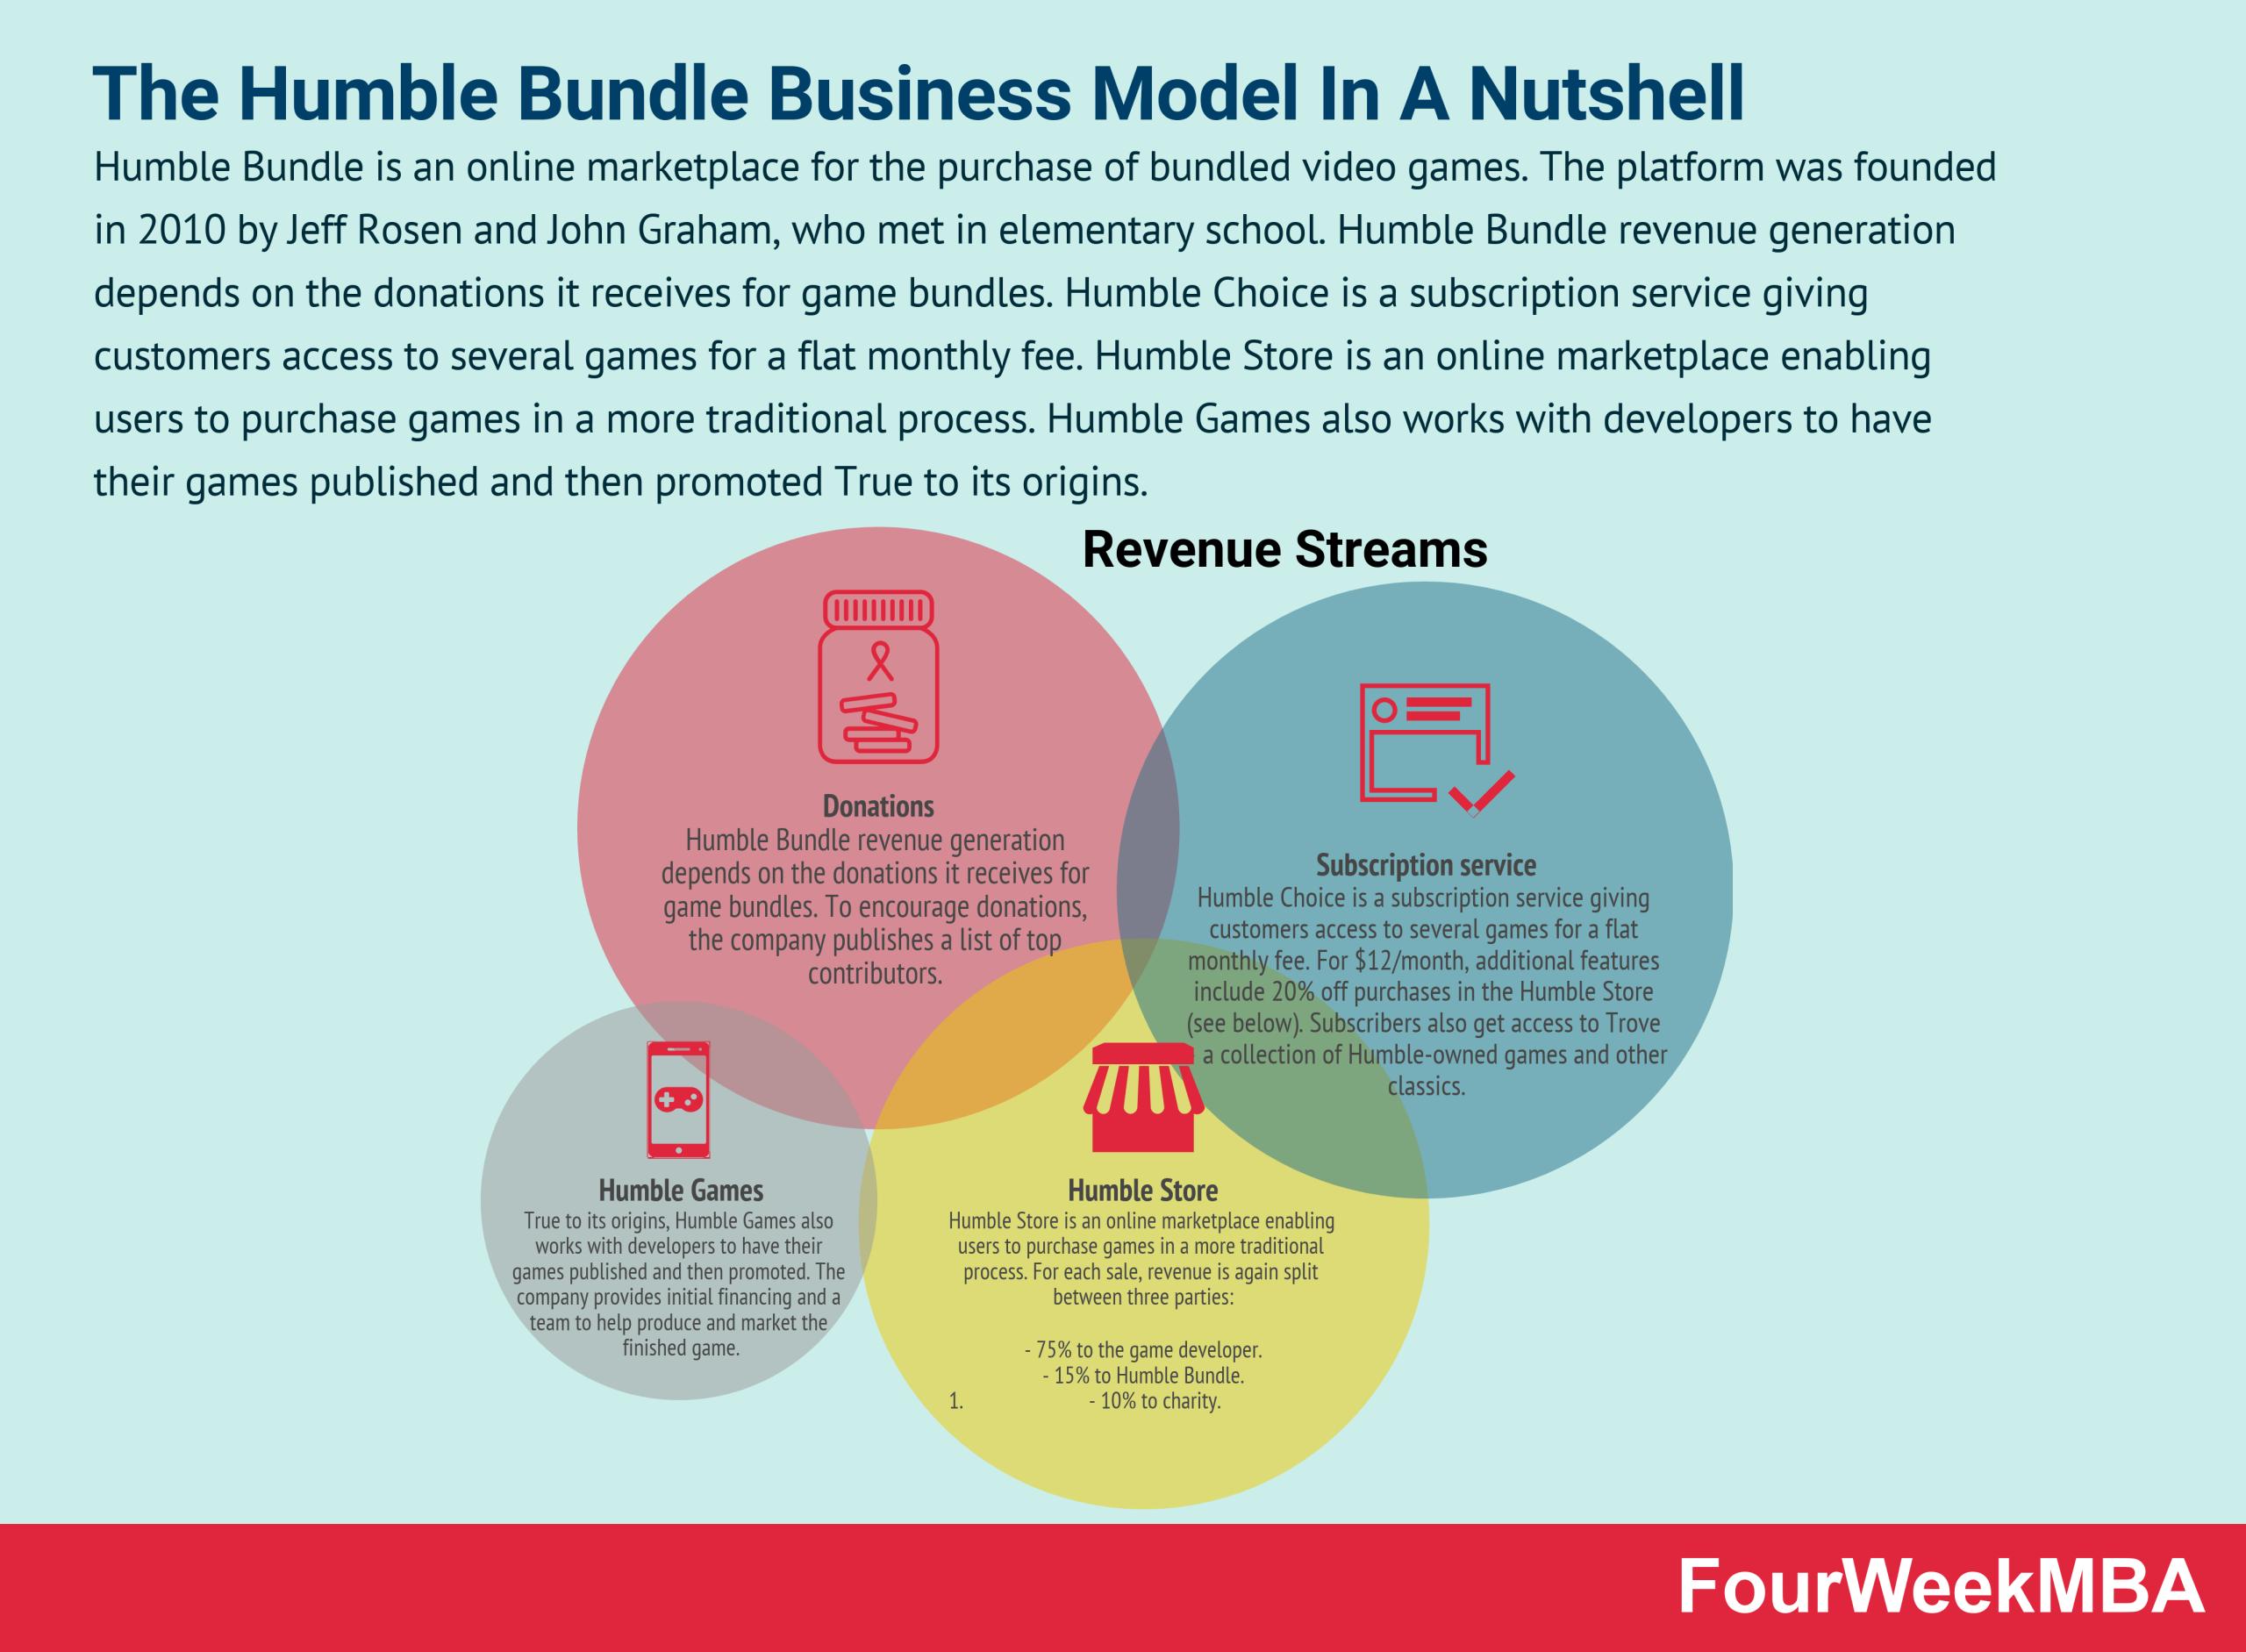 humble-bundle-business-model